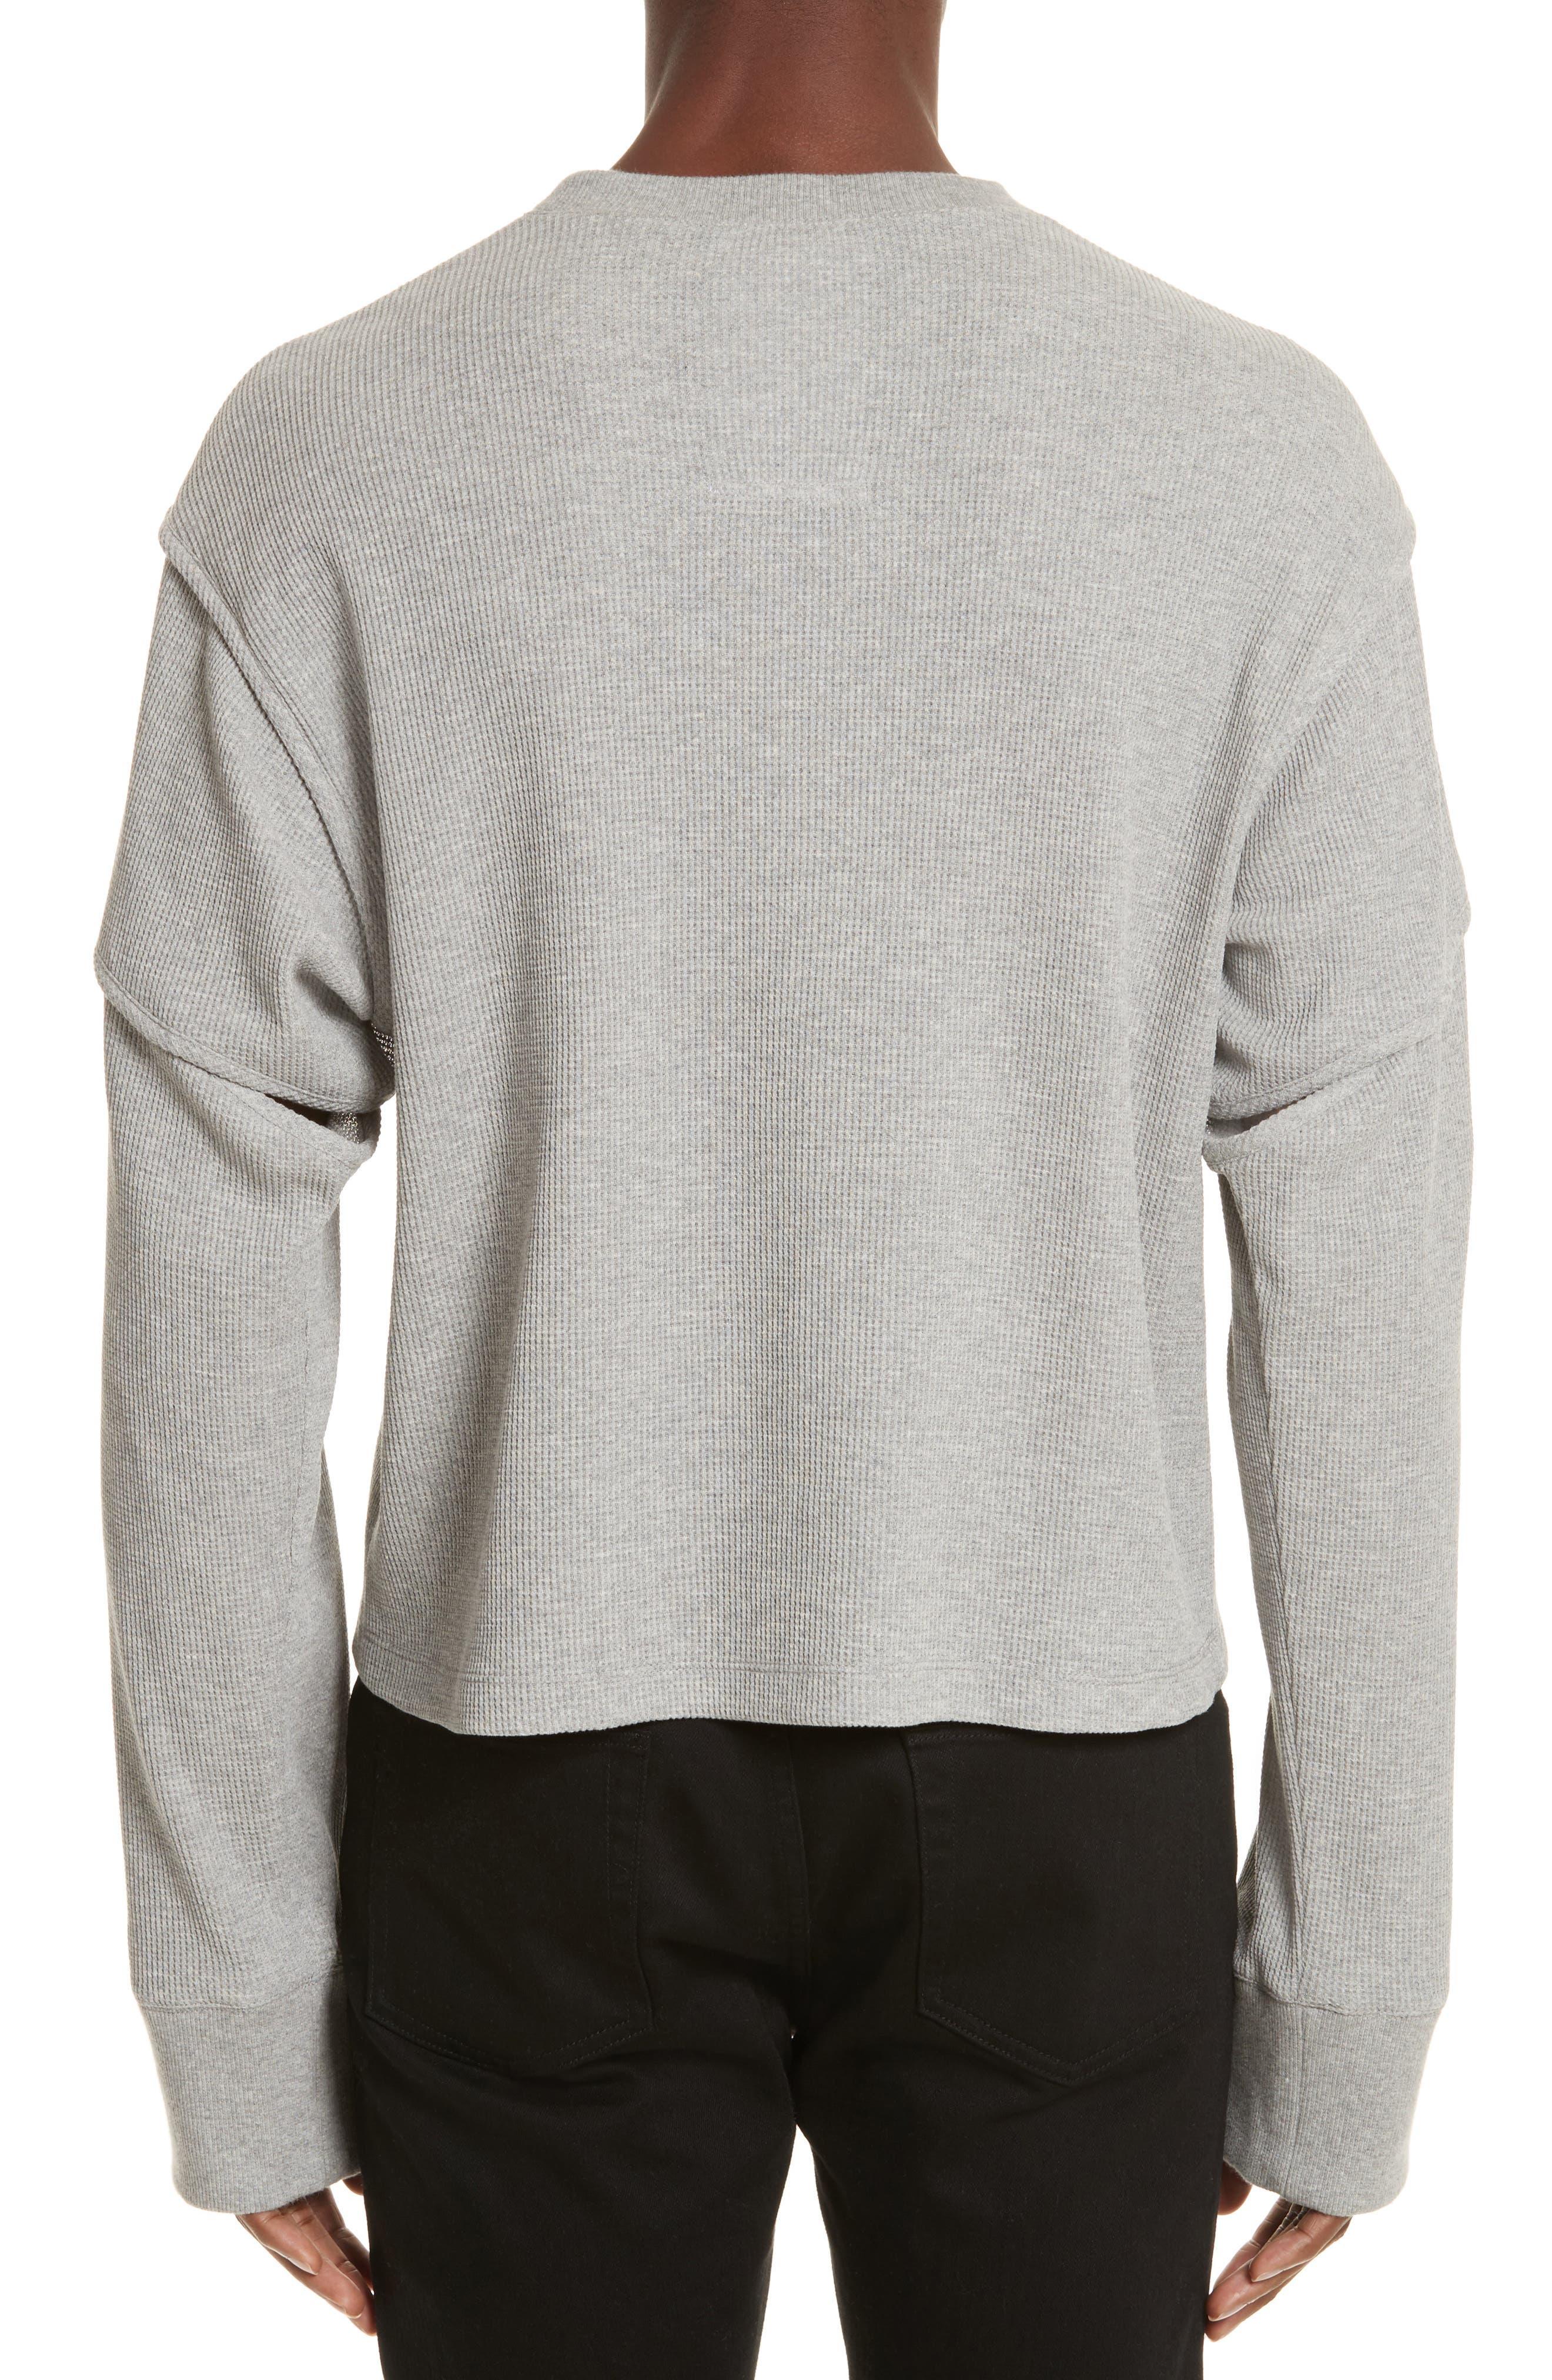 Military Panel Sleeve Thermal Shirt,                             Alternate thumbnail 2, color,                             029